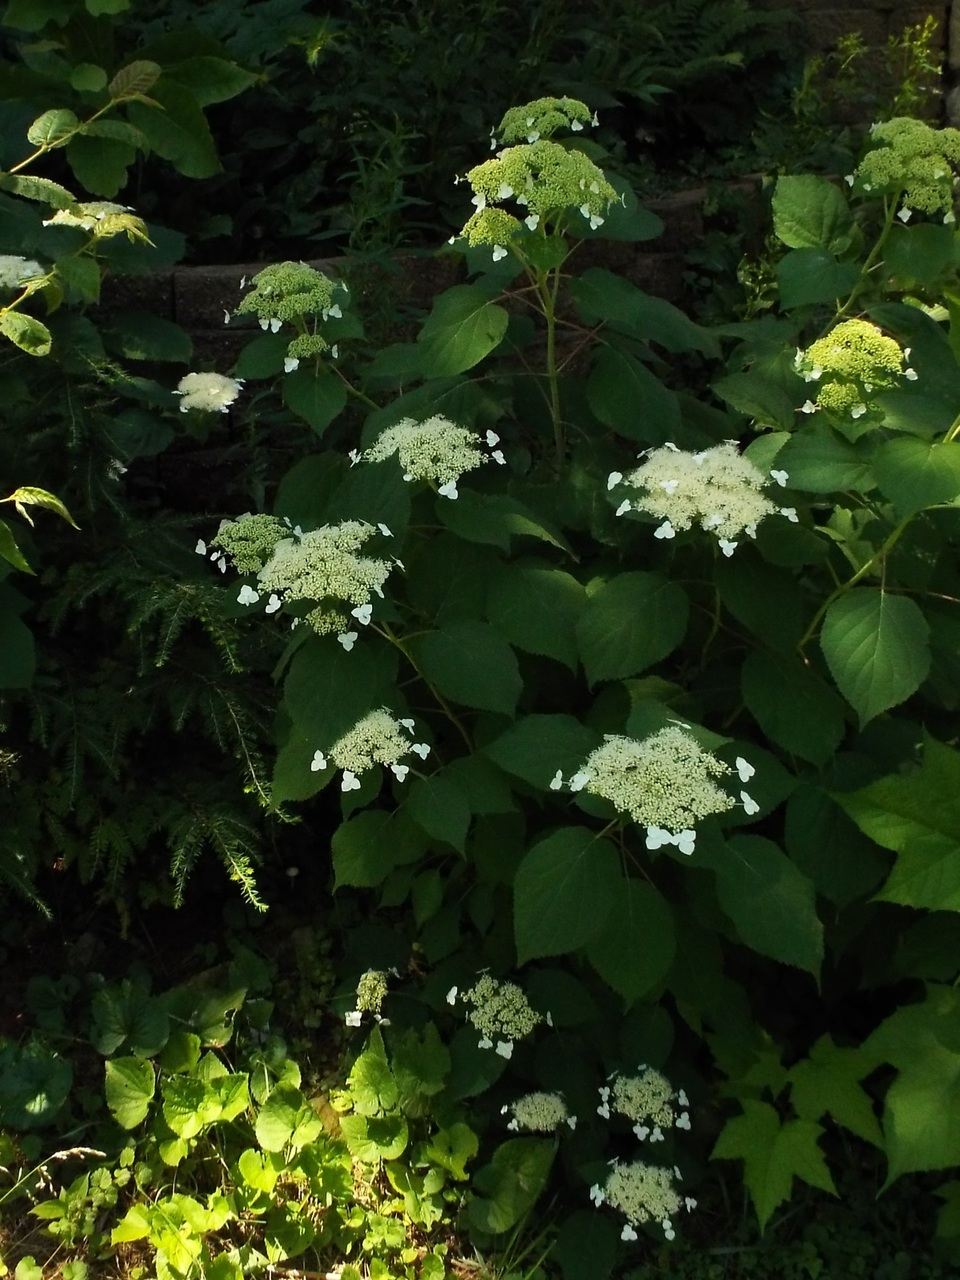 close-up of Wild Hydrangea (Hydrangea arborescens), beginning to bloom in Mid-June in full shade